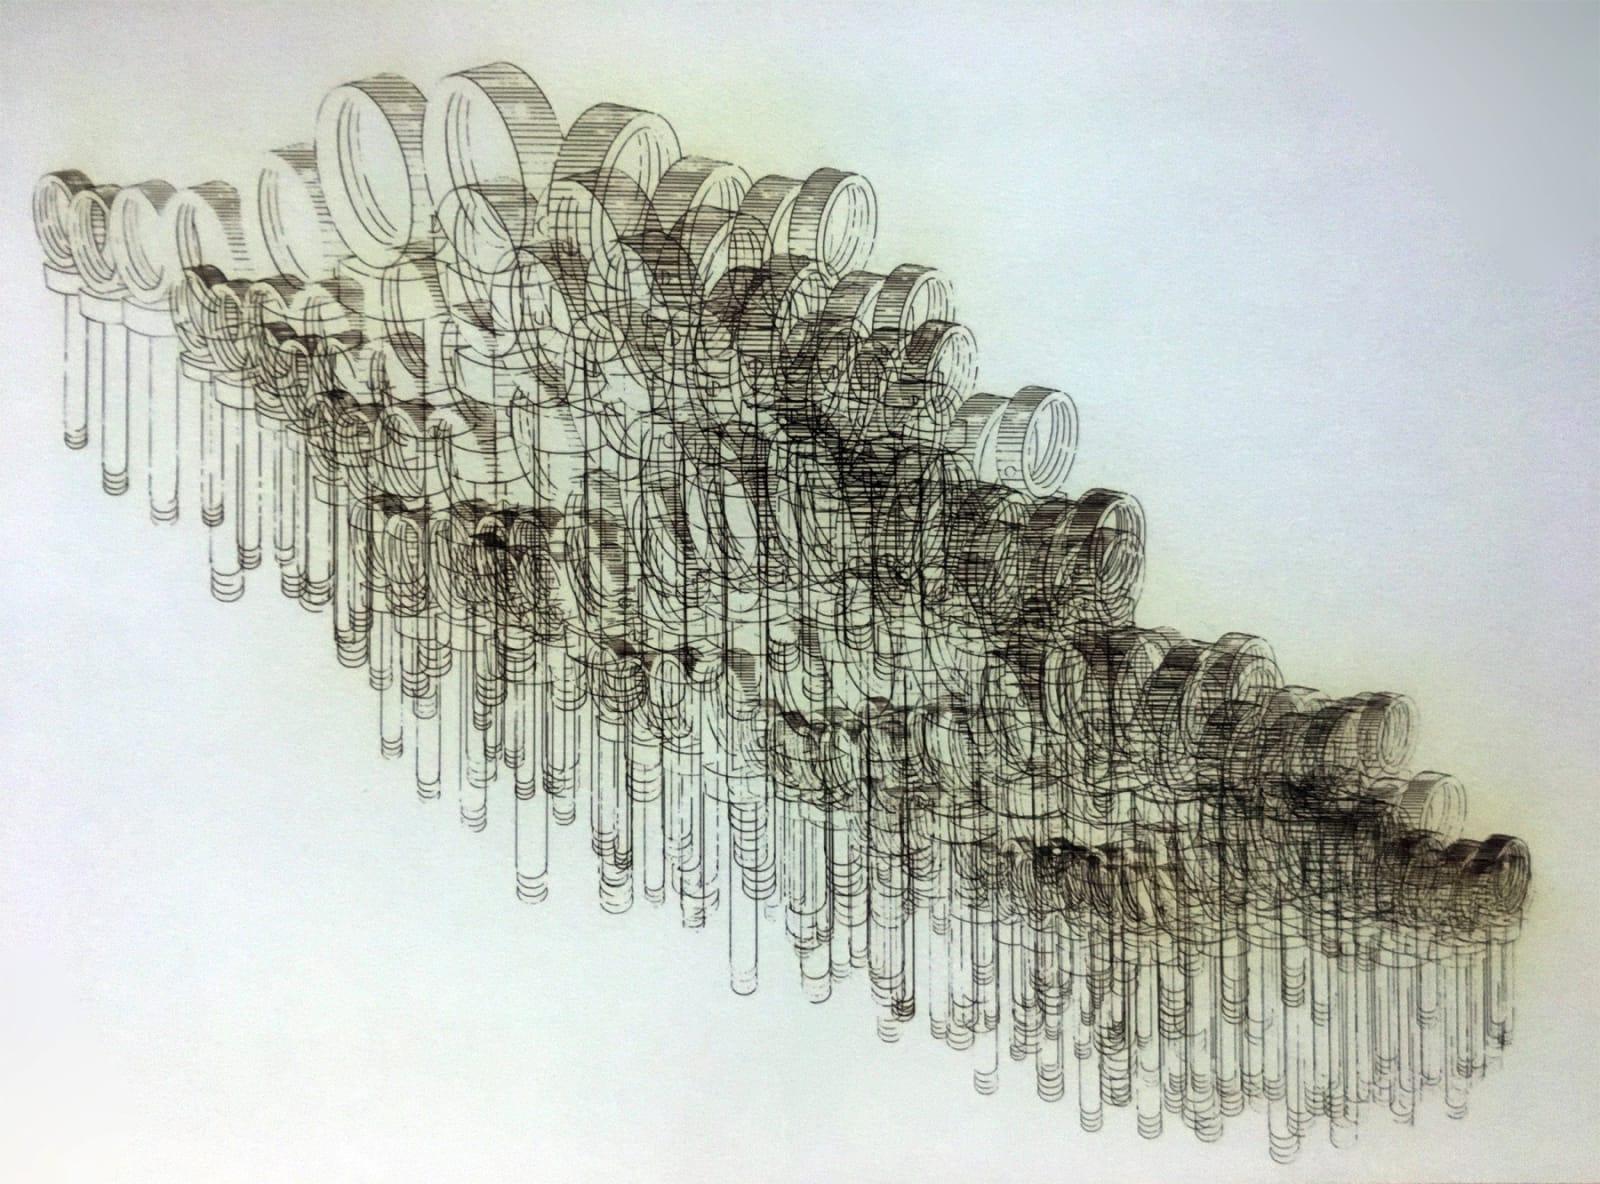 Craig Kaths sculpture